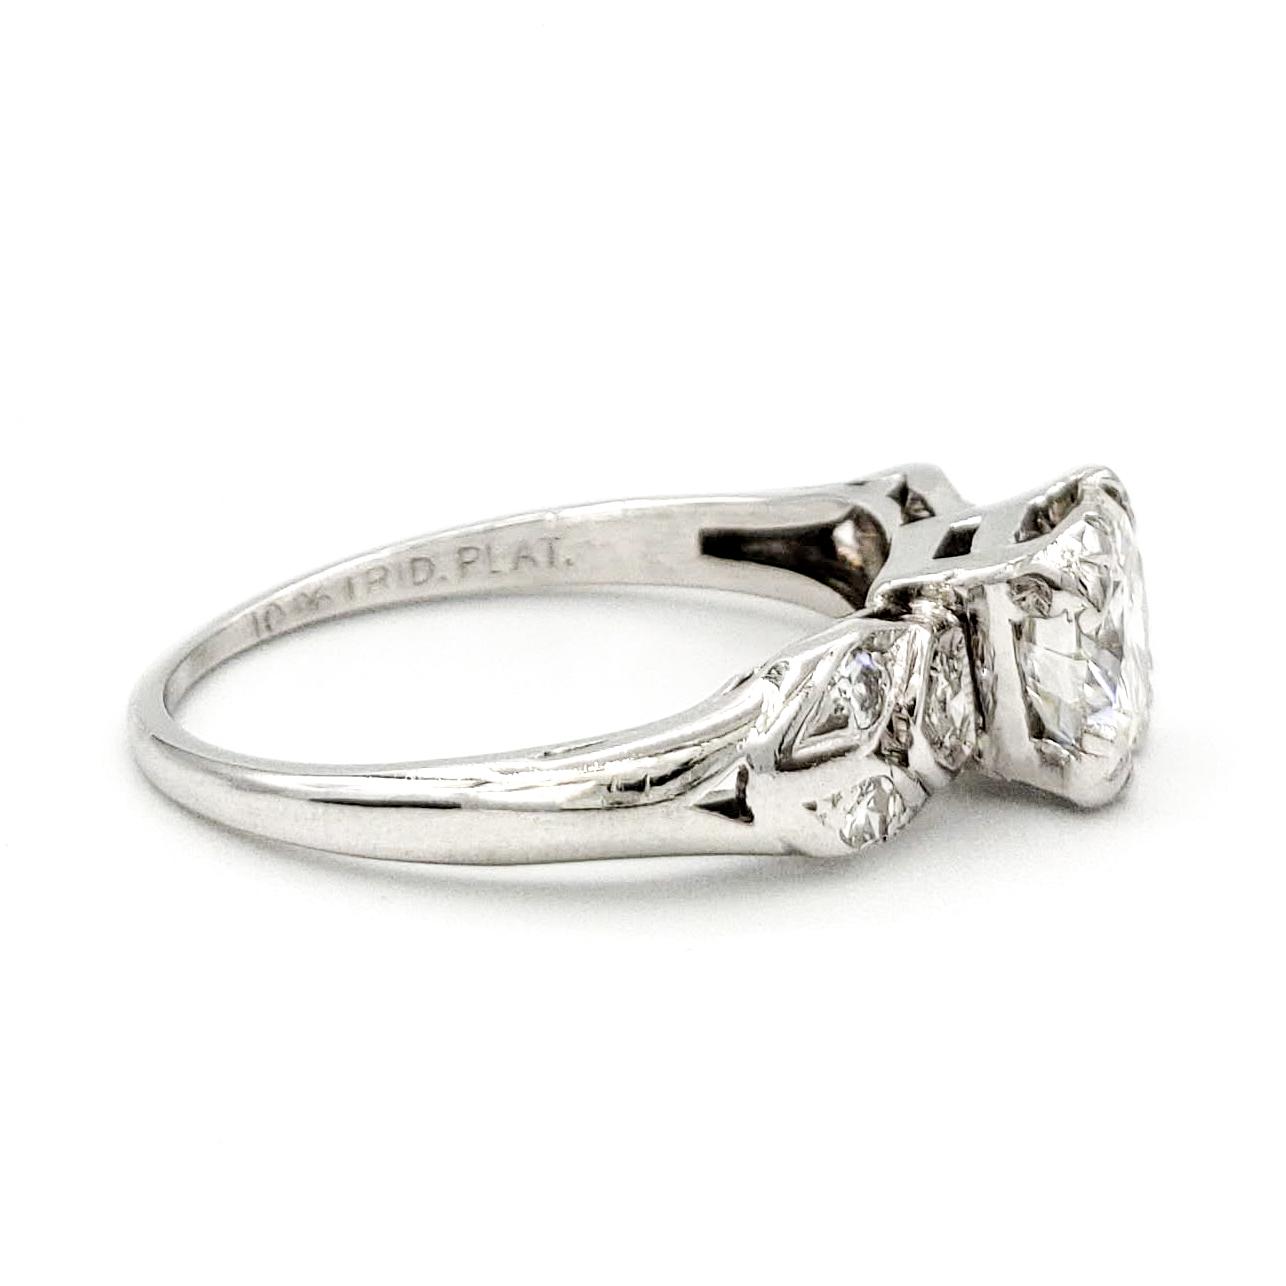 vintage-platinum-engagement-ring-with-0-72-round-brilliant-cut-diamond-egl-g-vs1